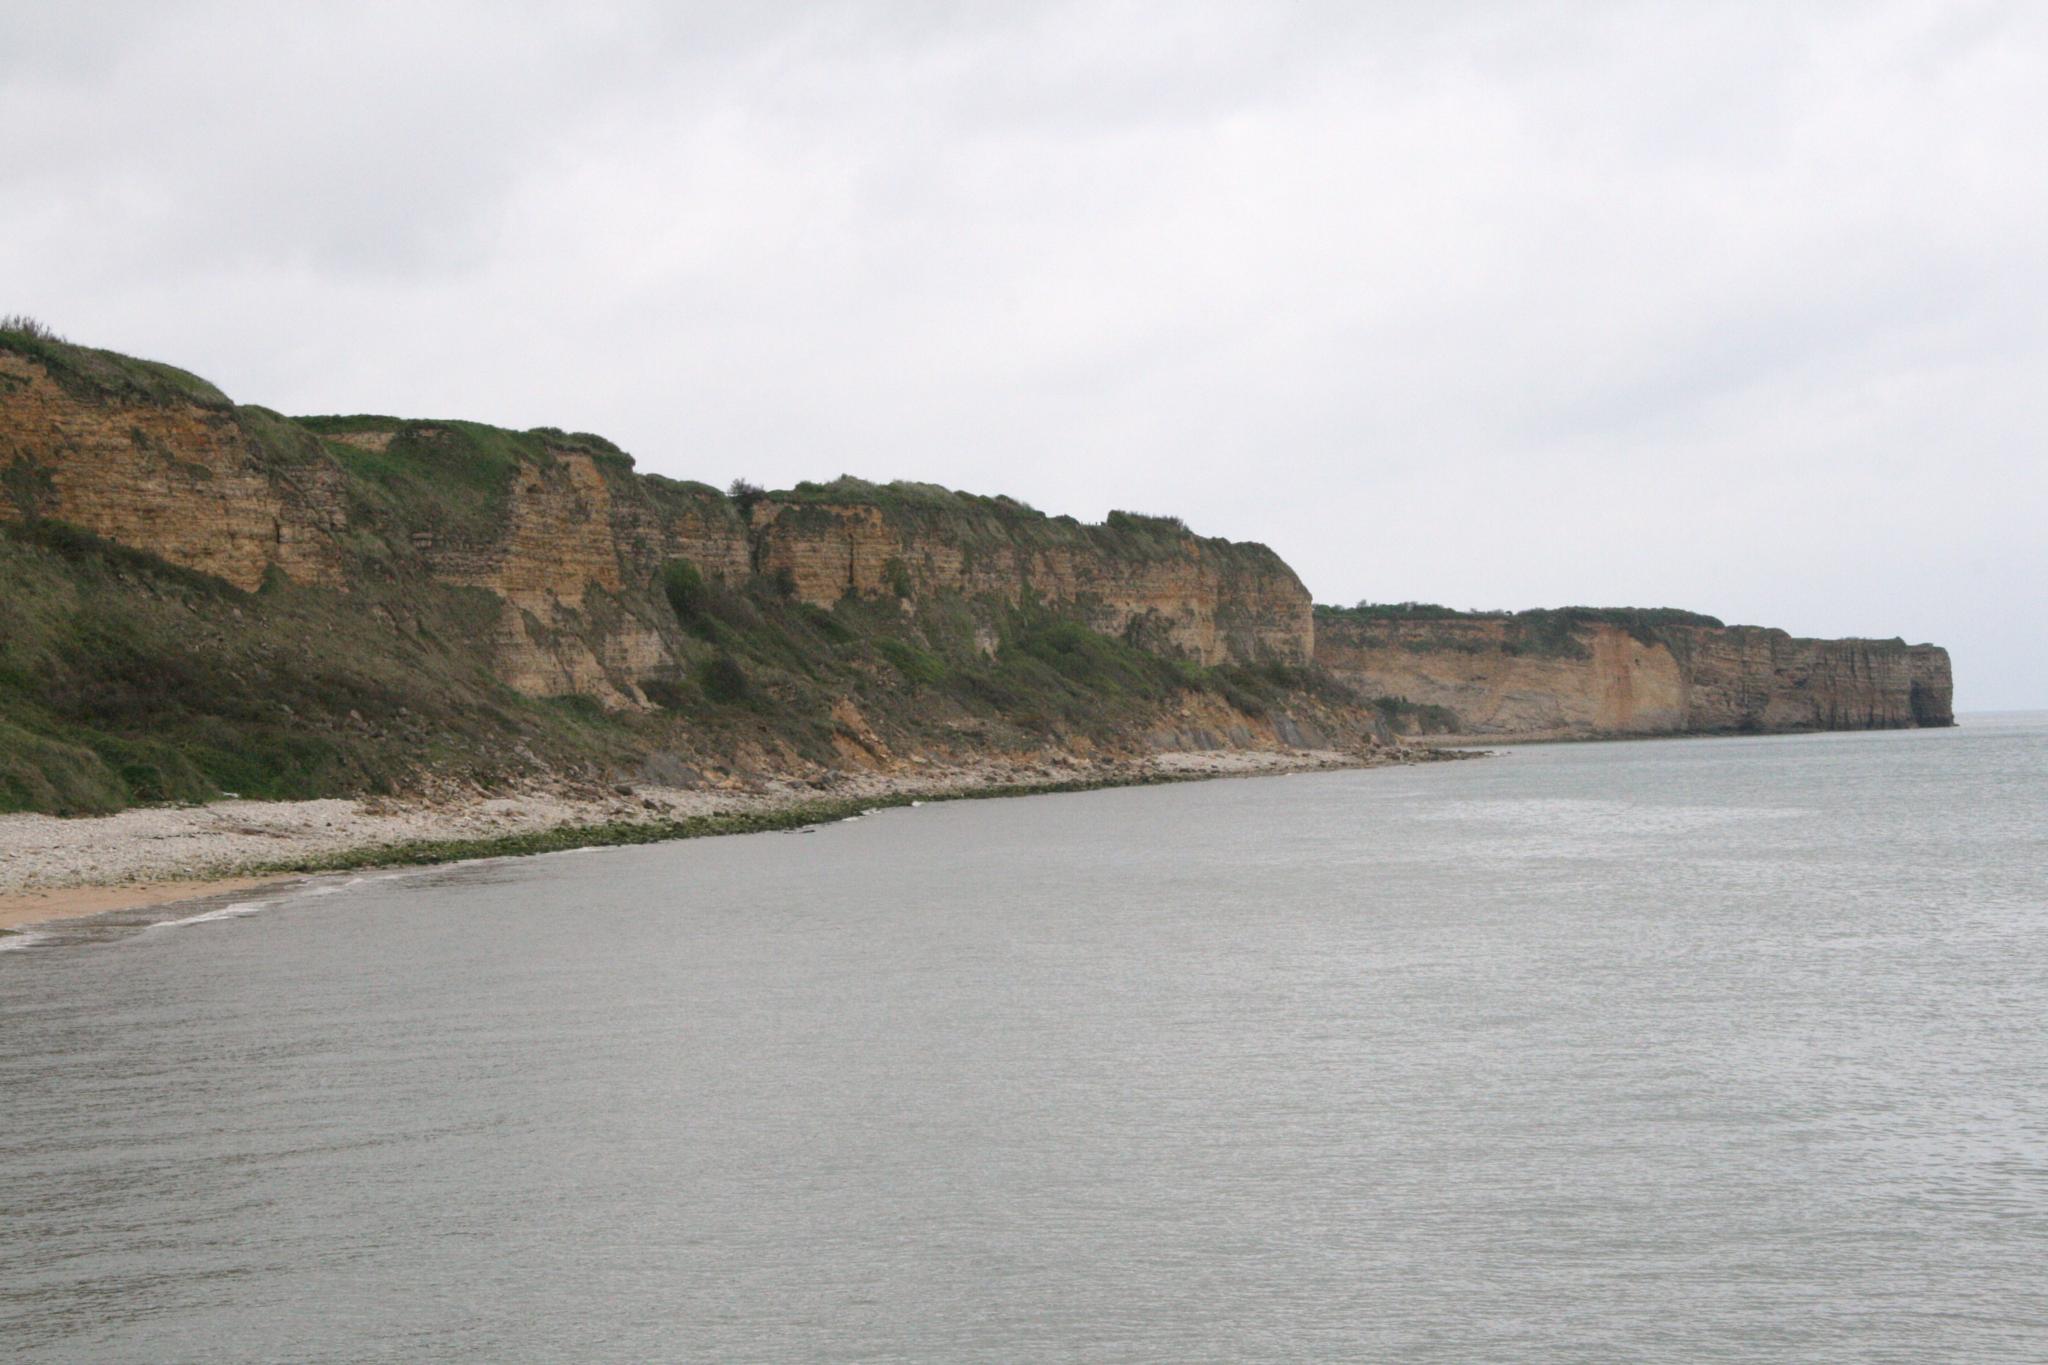 One of the beaches in Normandy by helen.vandenbroek.9